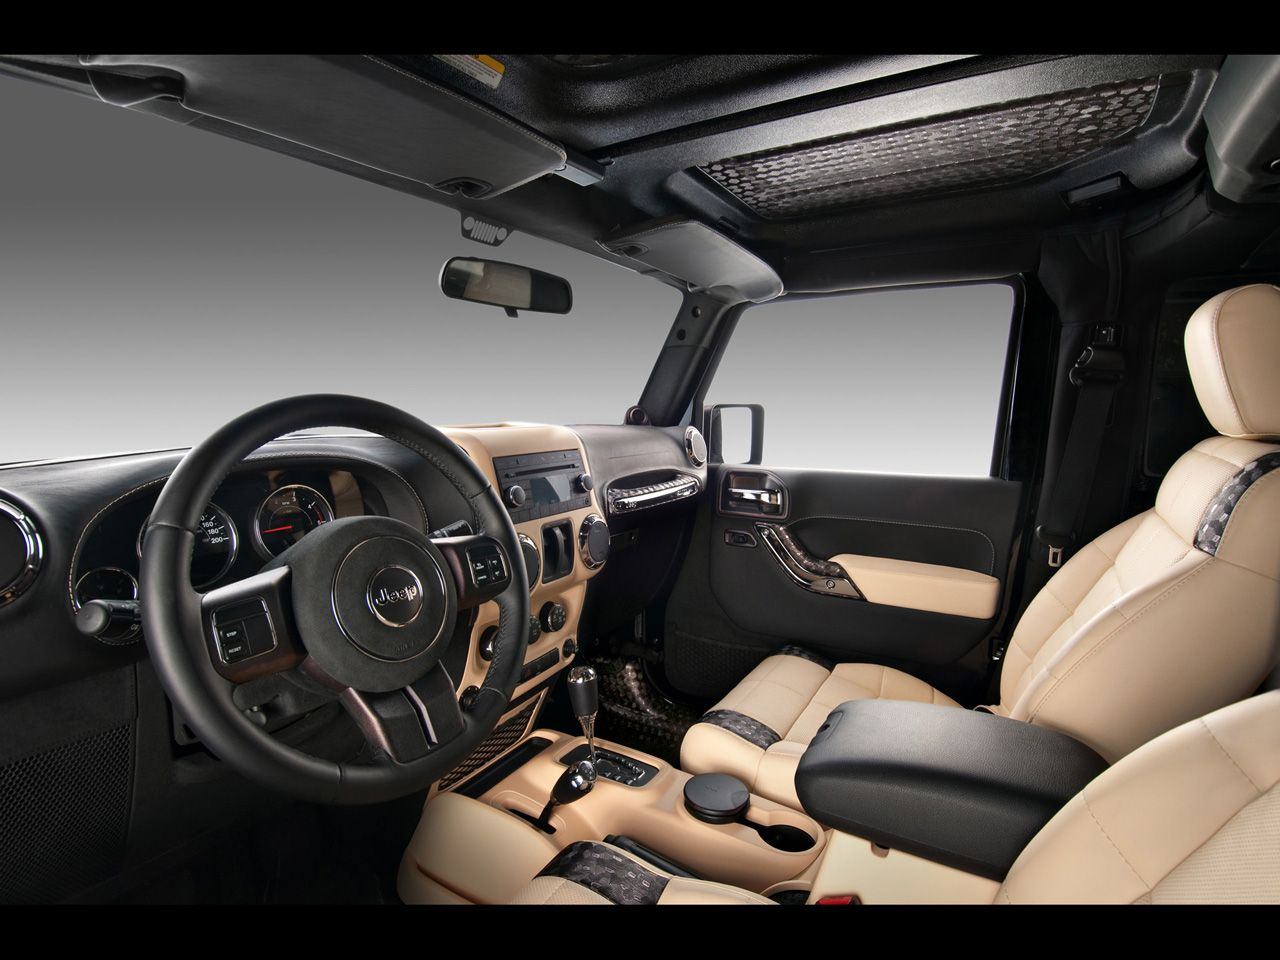 2012 vilner jeep wrangler dashboard 2 1280x960 2012 vilner - 2012 jeep wrangler unlimited interior ...